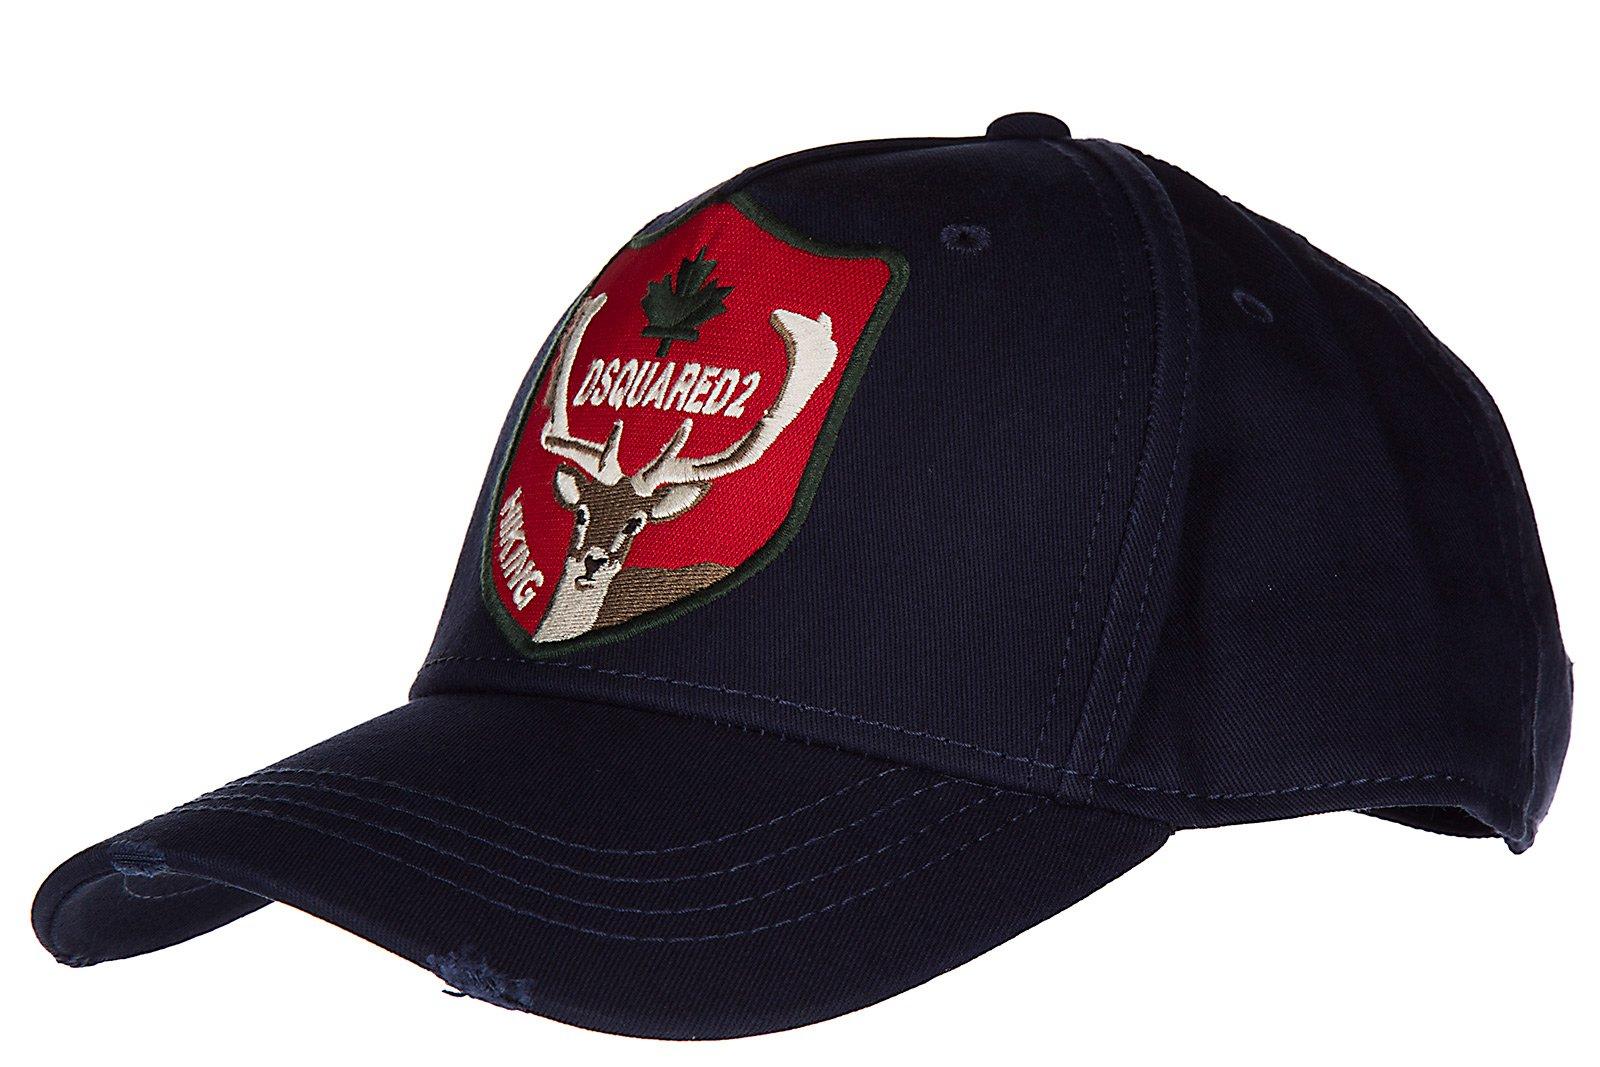 Dsquared2 adjustable men's cotton hat baseball cap gabardine blu